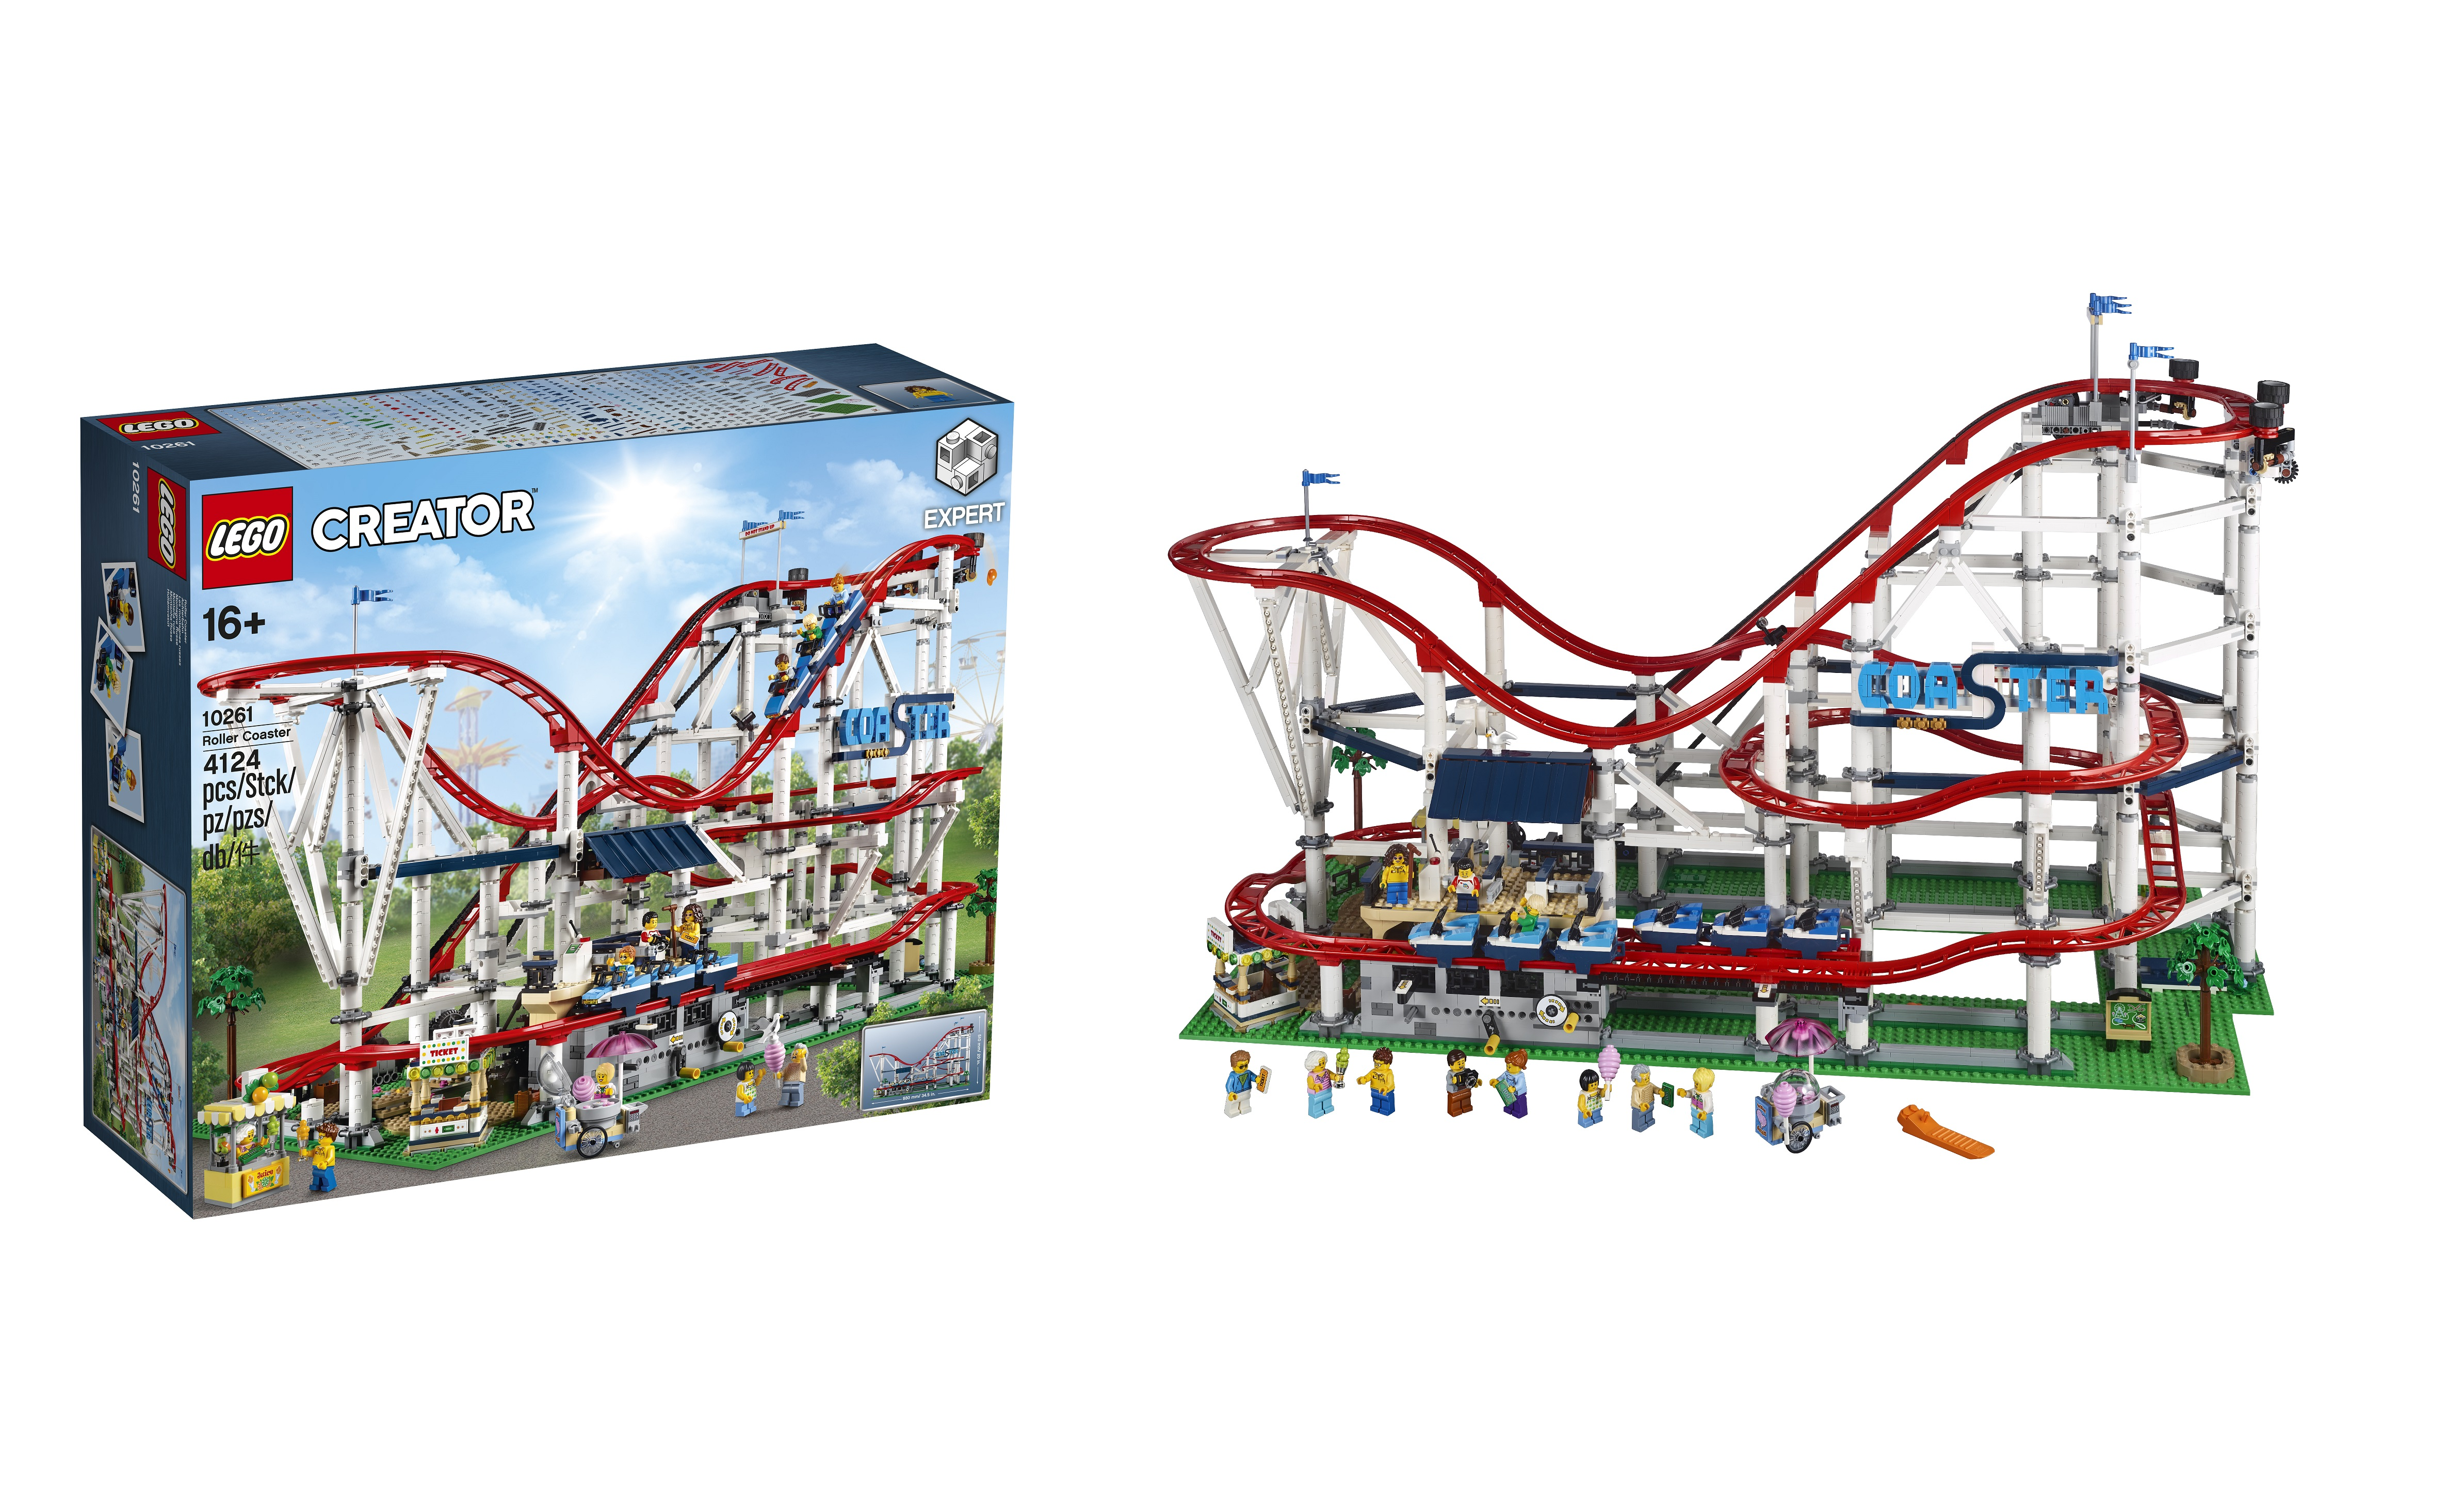 lego announces 10261 creator expert roller coaster jay. Black Bedroom Furniture Sets. Home Design Ideas